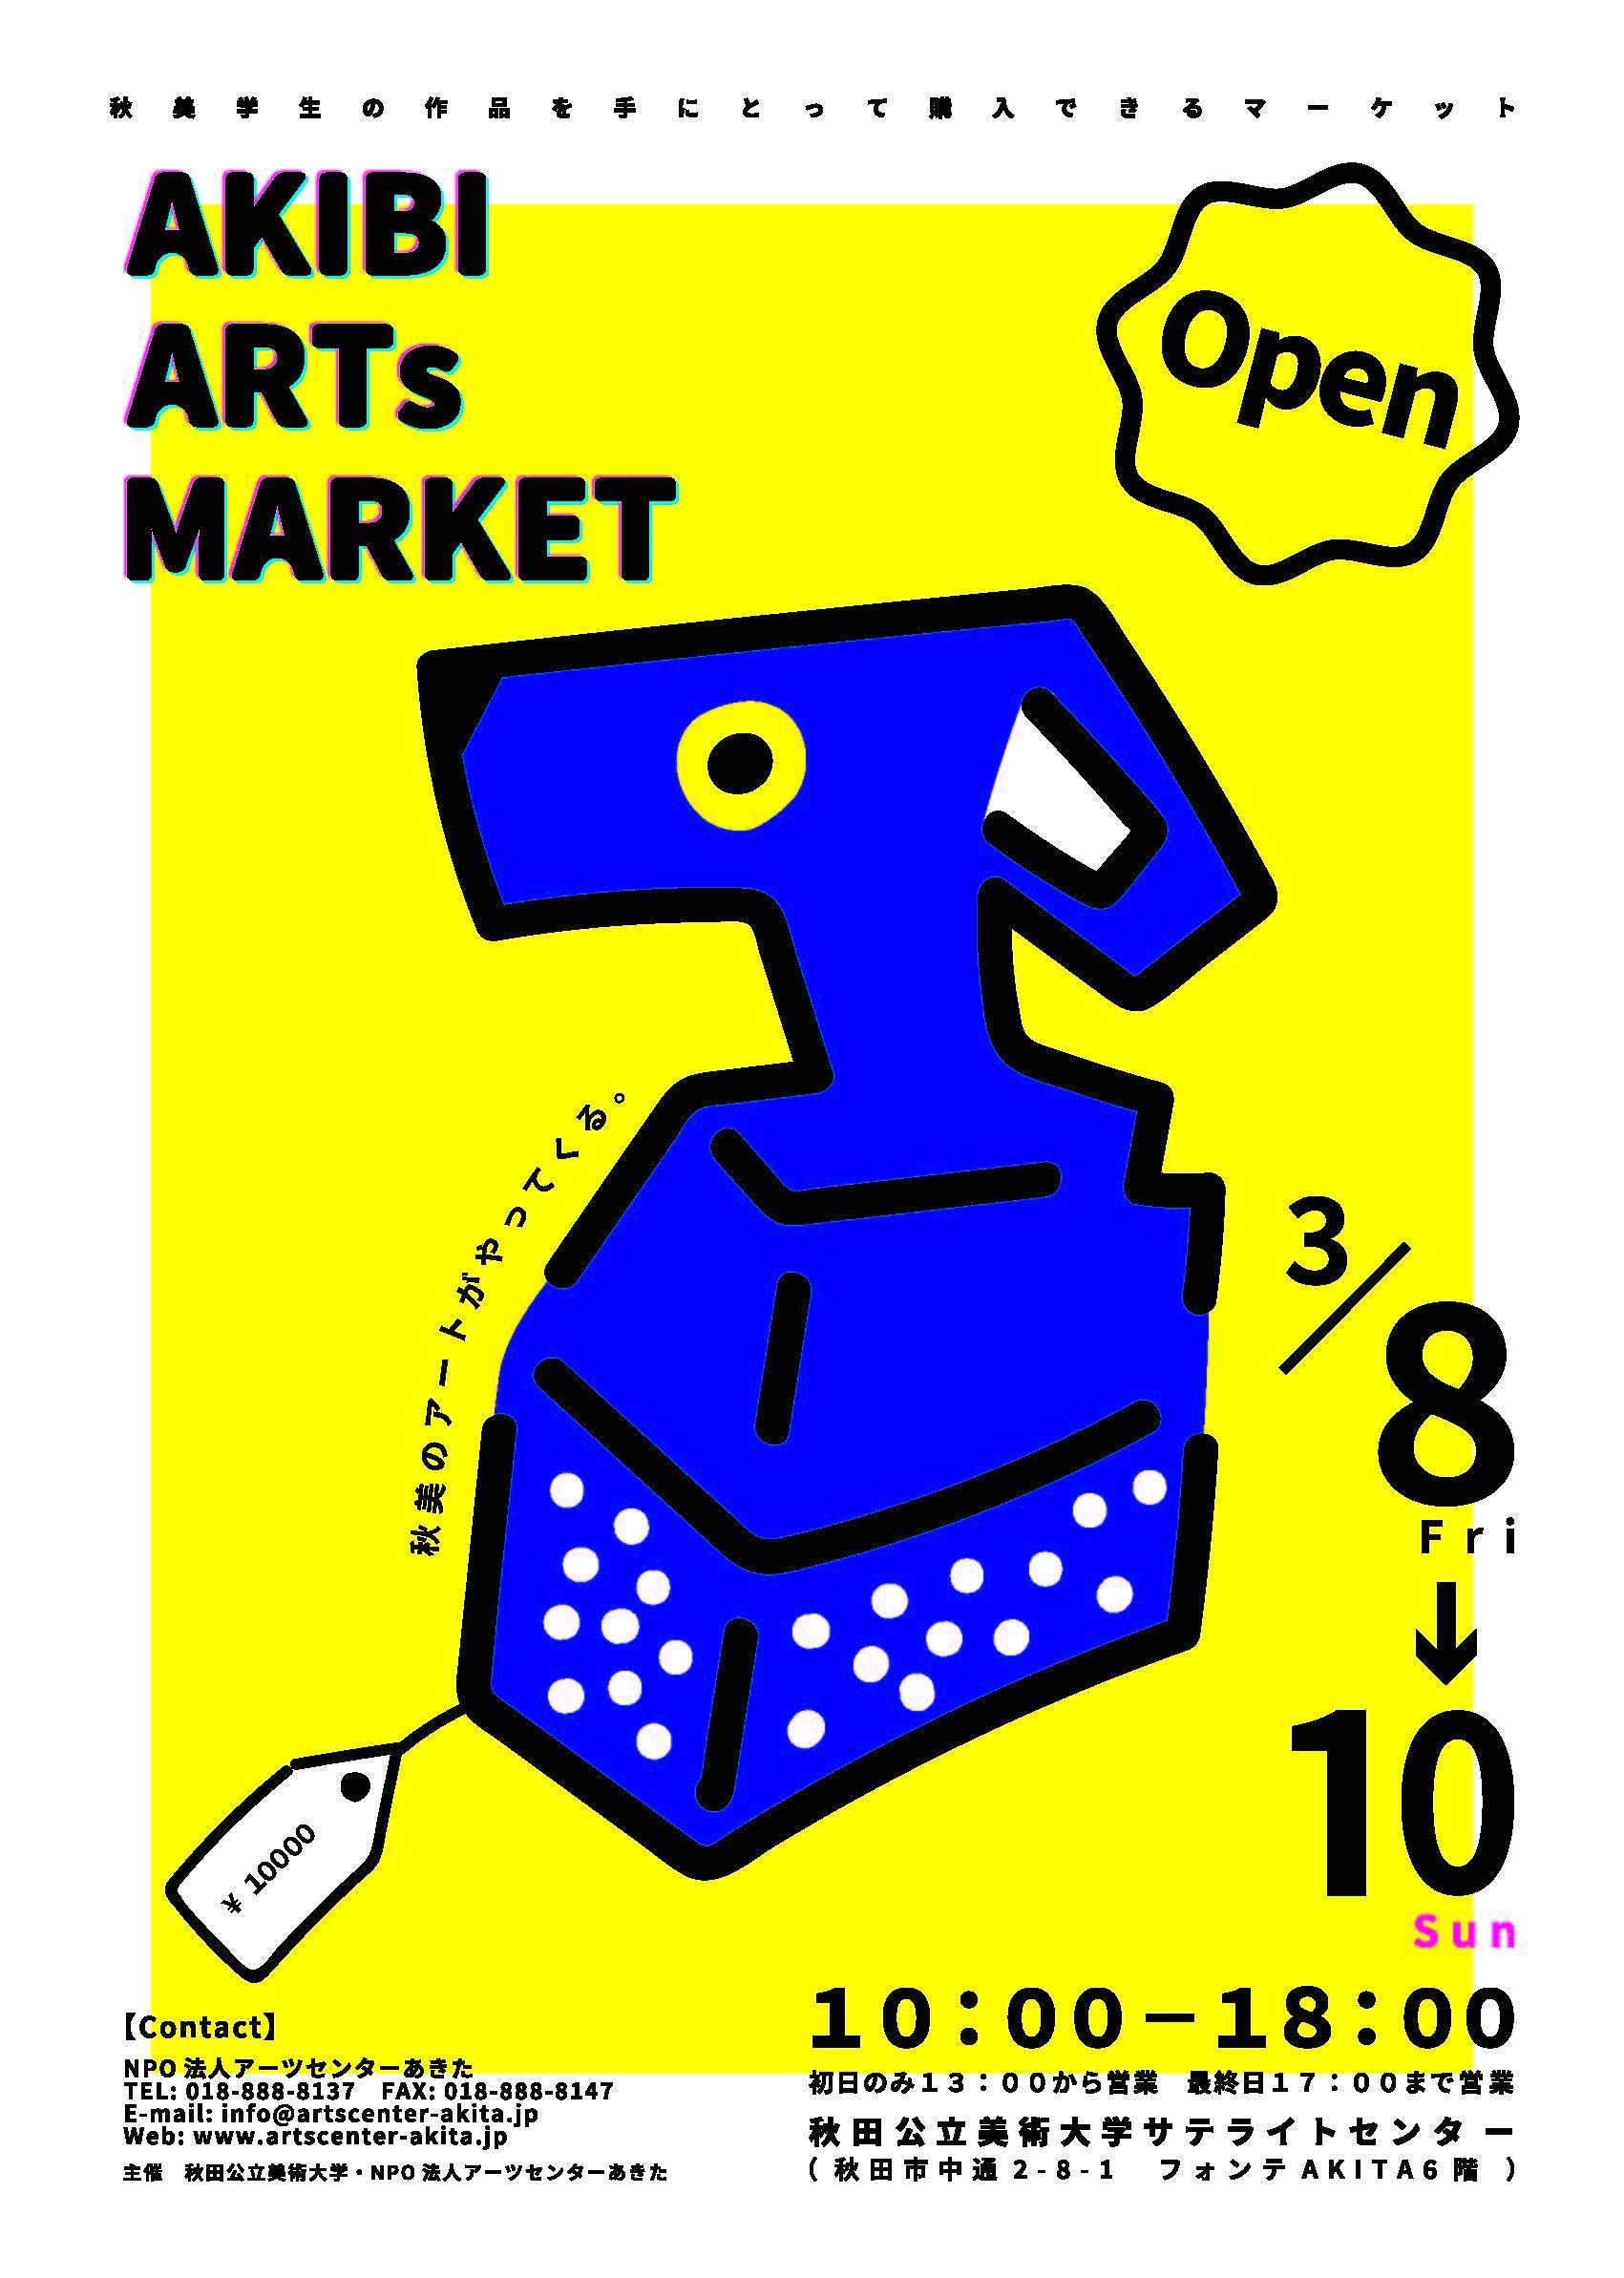 「AKIBI ARTs MARKET」